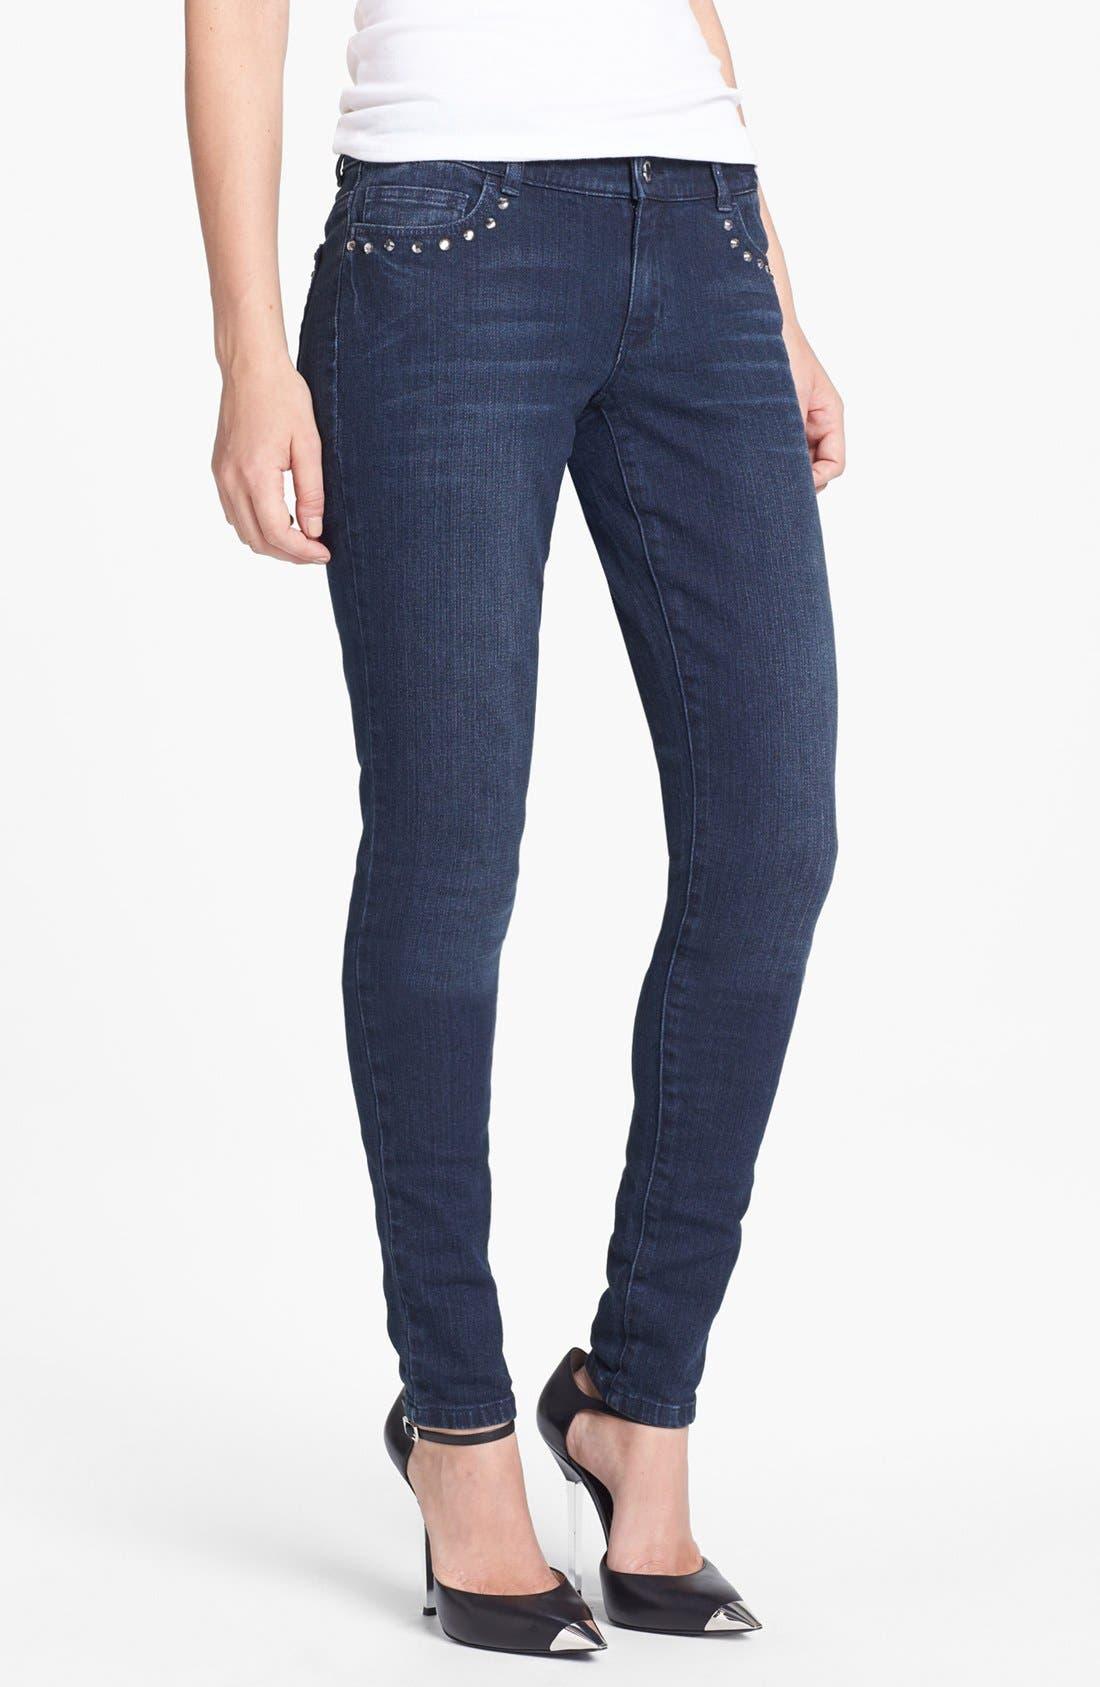 Alternate Image 1 Selected - MICHAEL Michael Kors Embellished Skinny Jeans (Stellar)